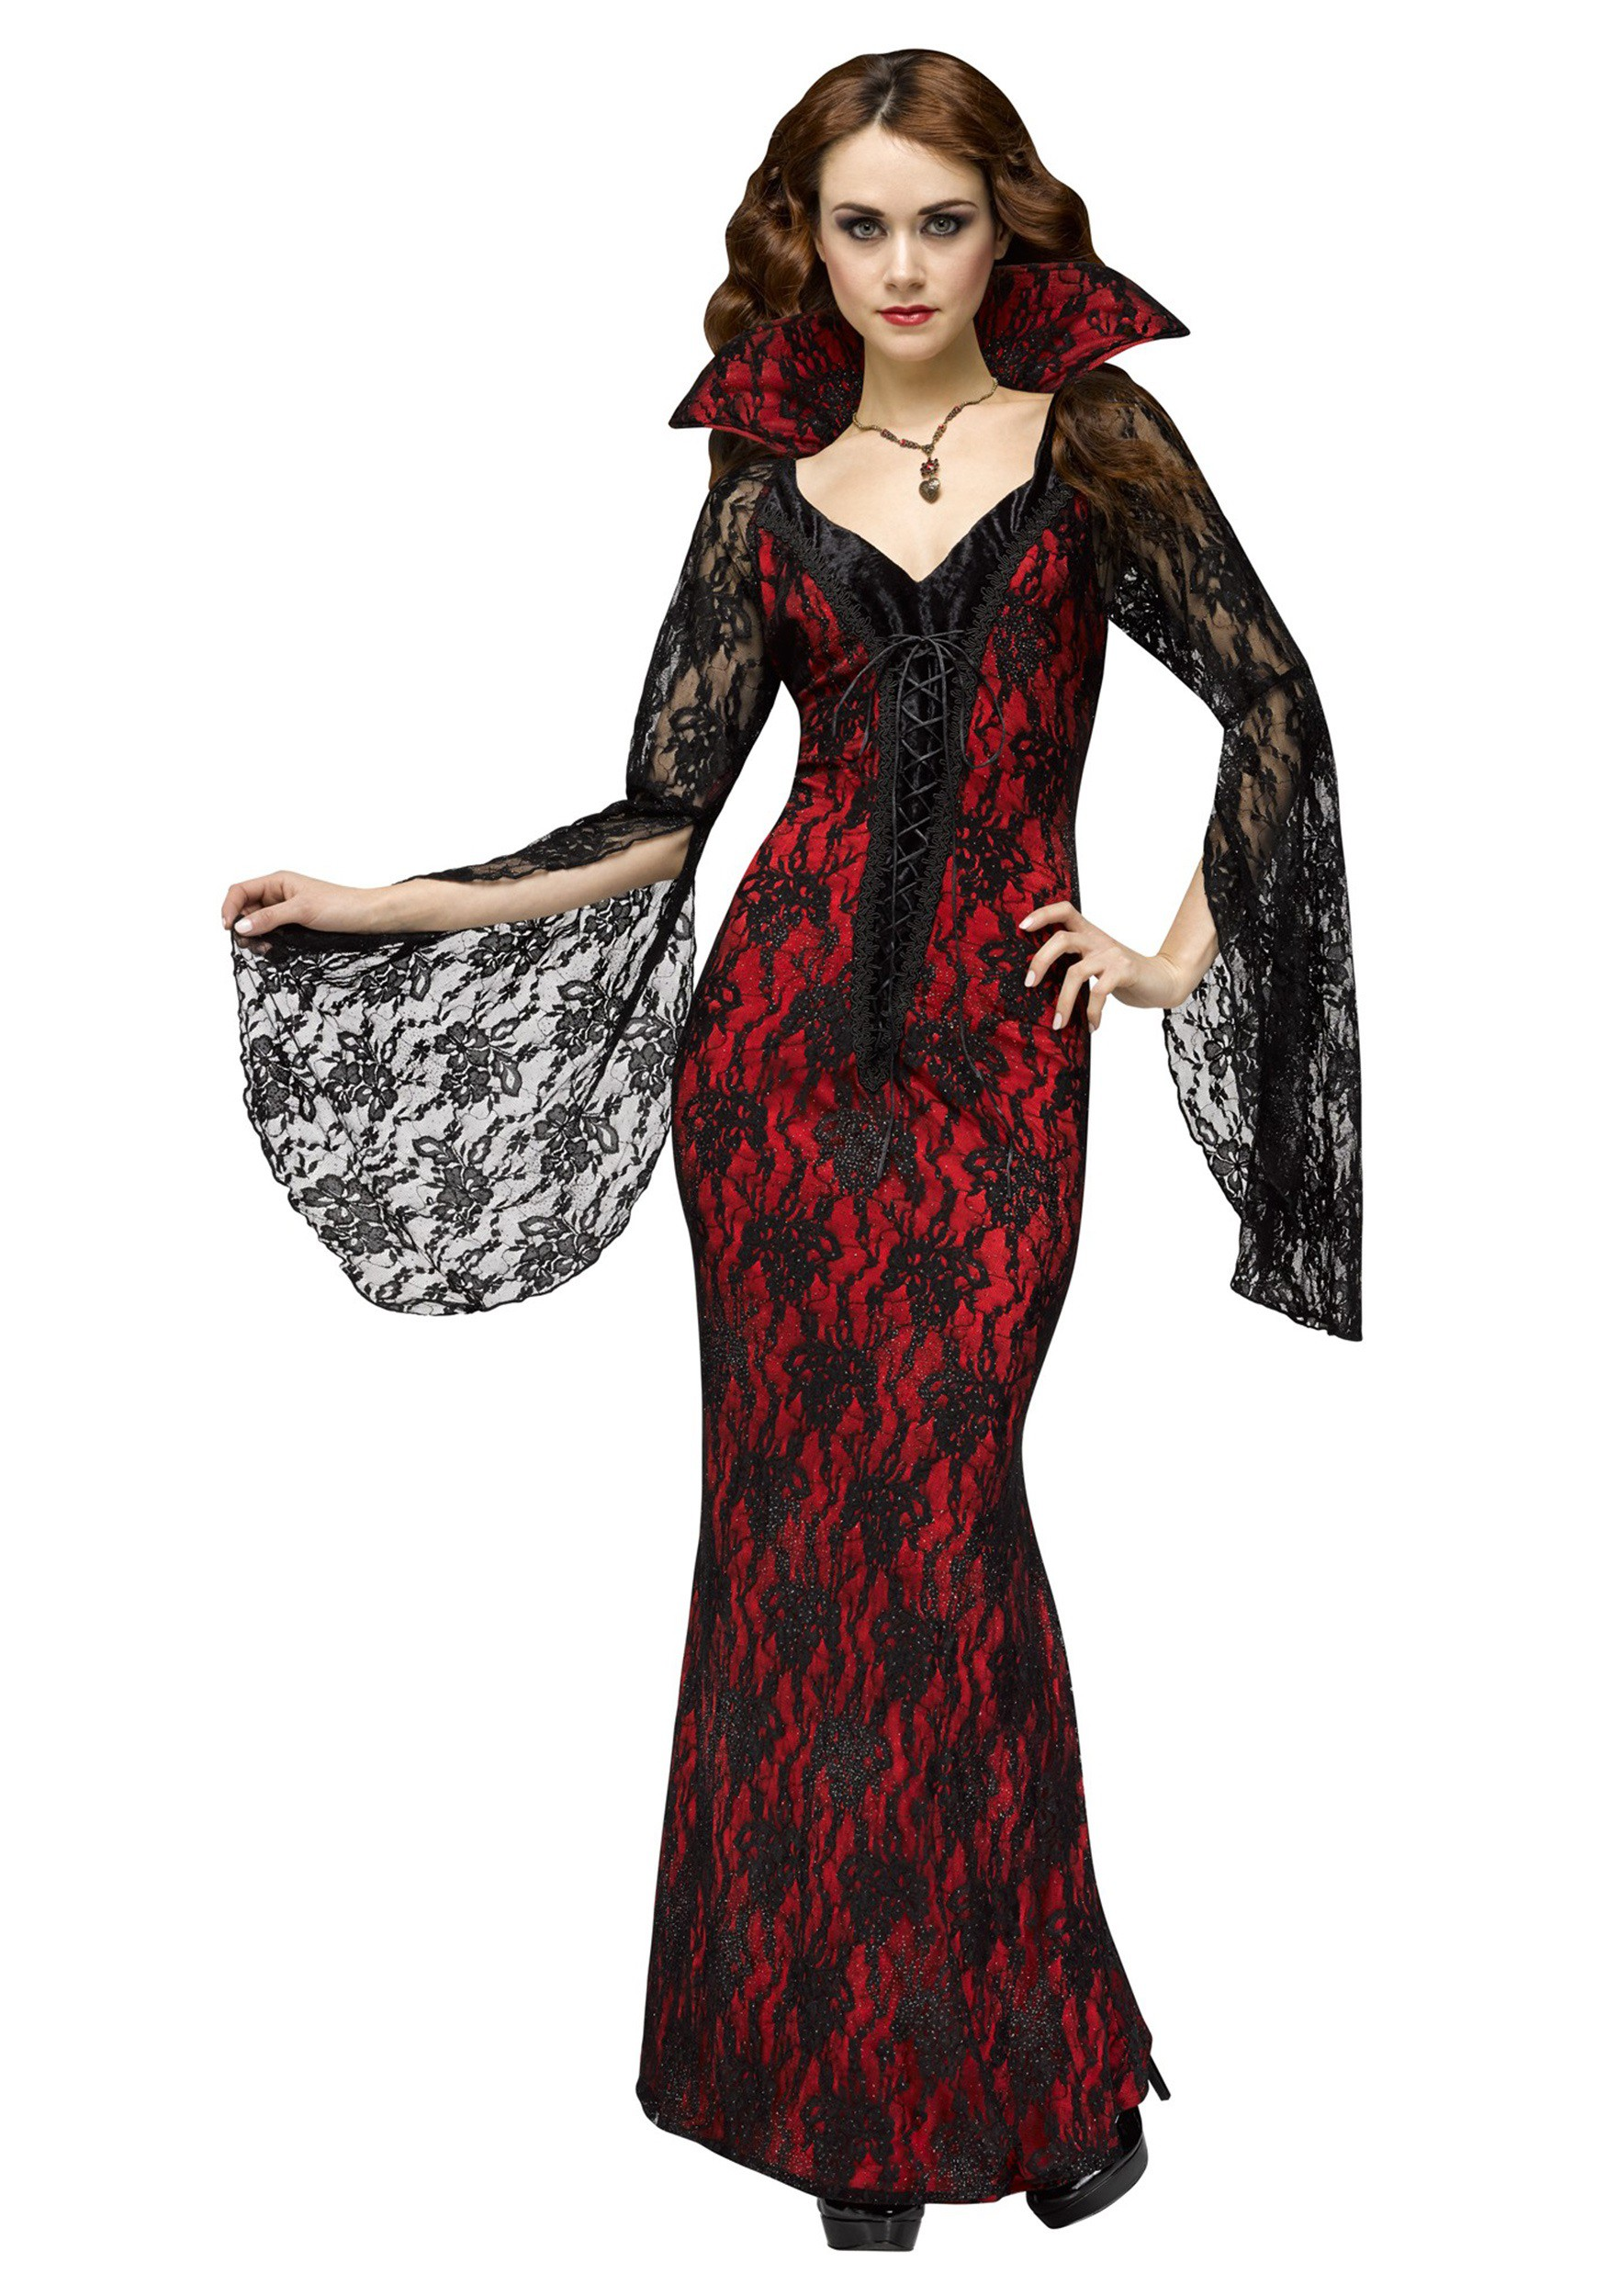 d5a282effb1 Women s Vampire Costumes - Adult Woman Vampire Costume